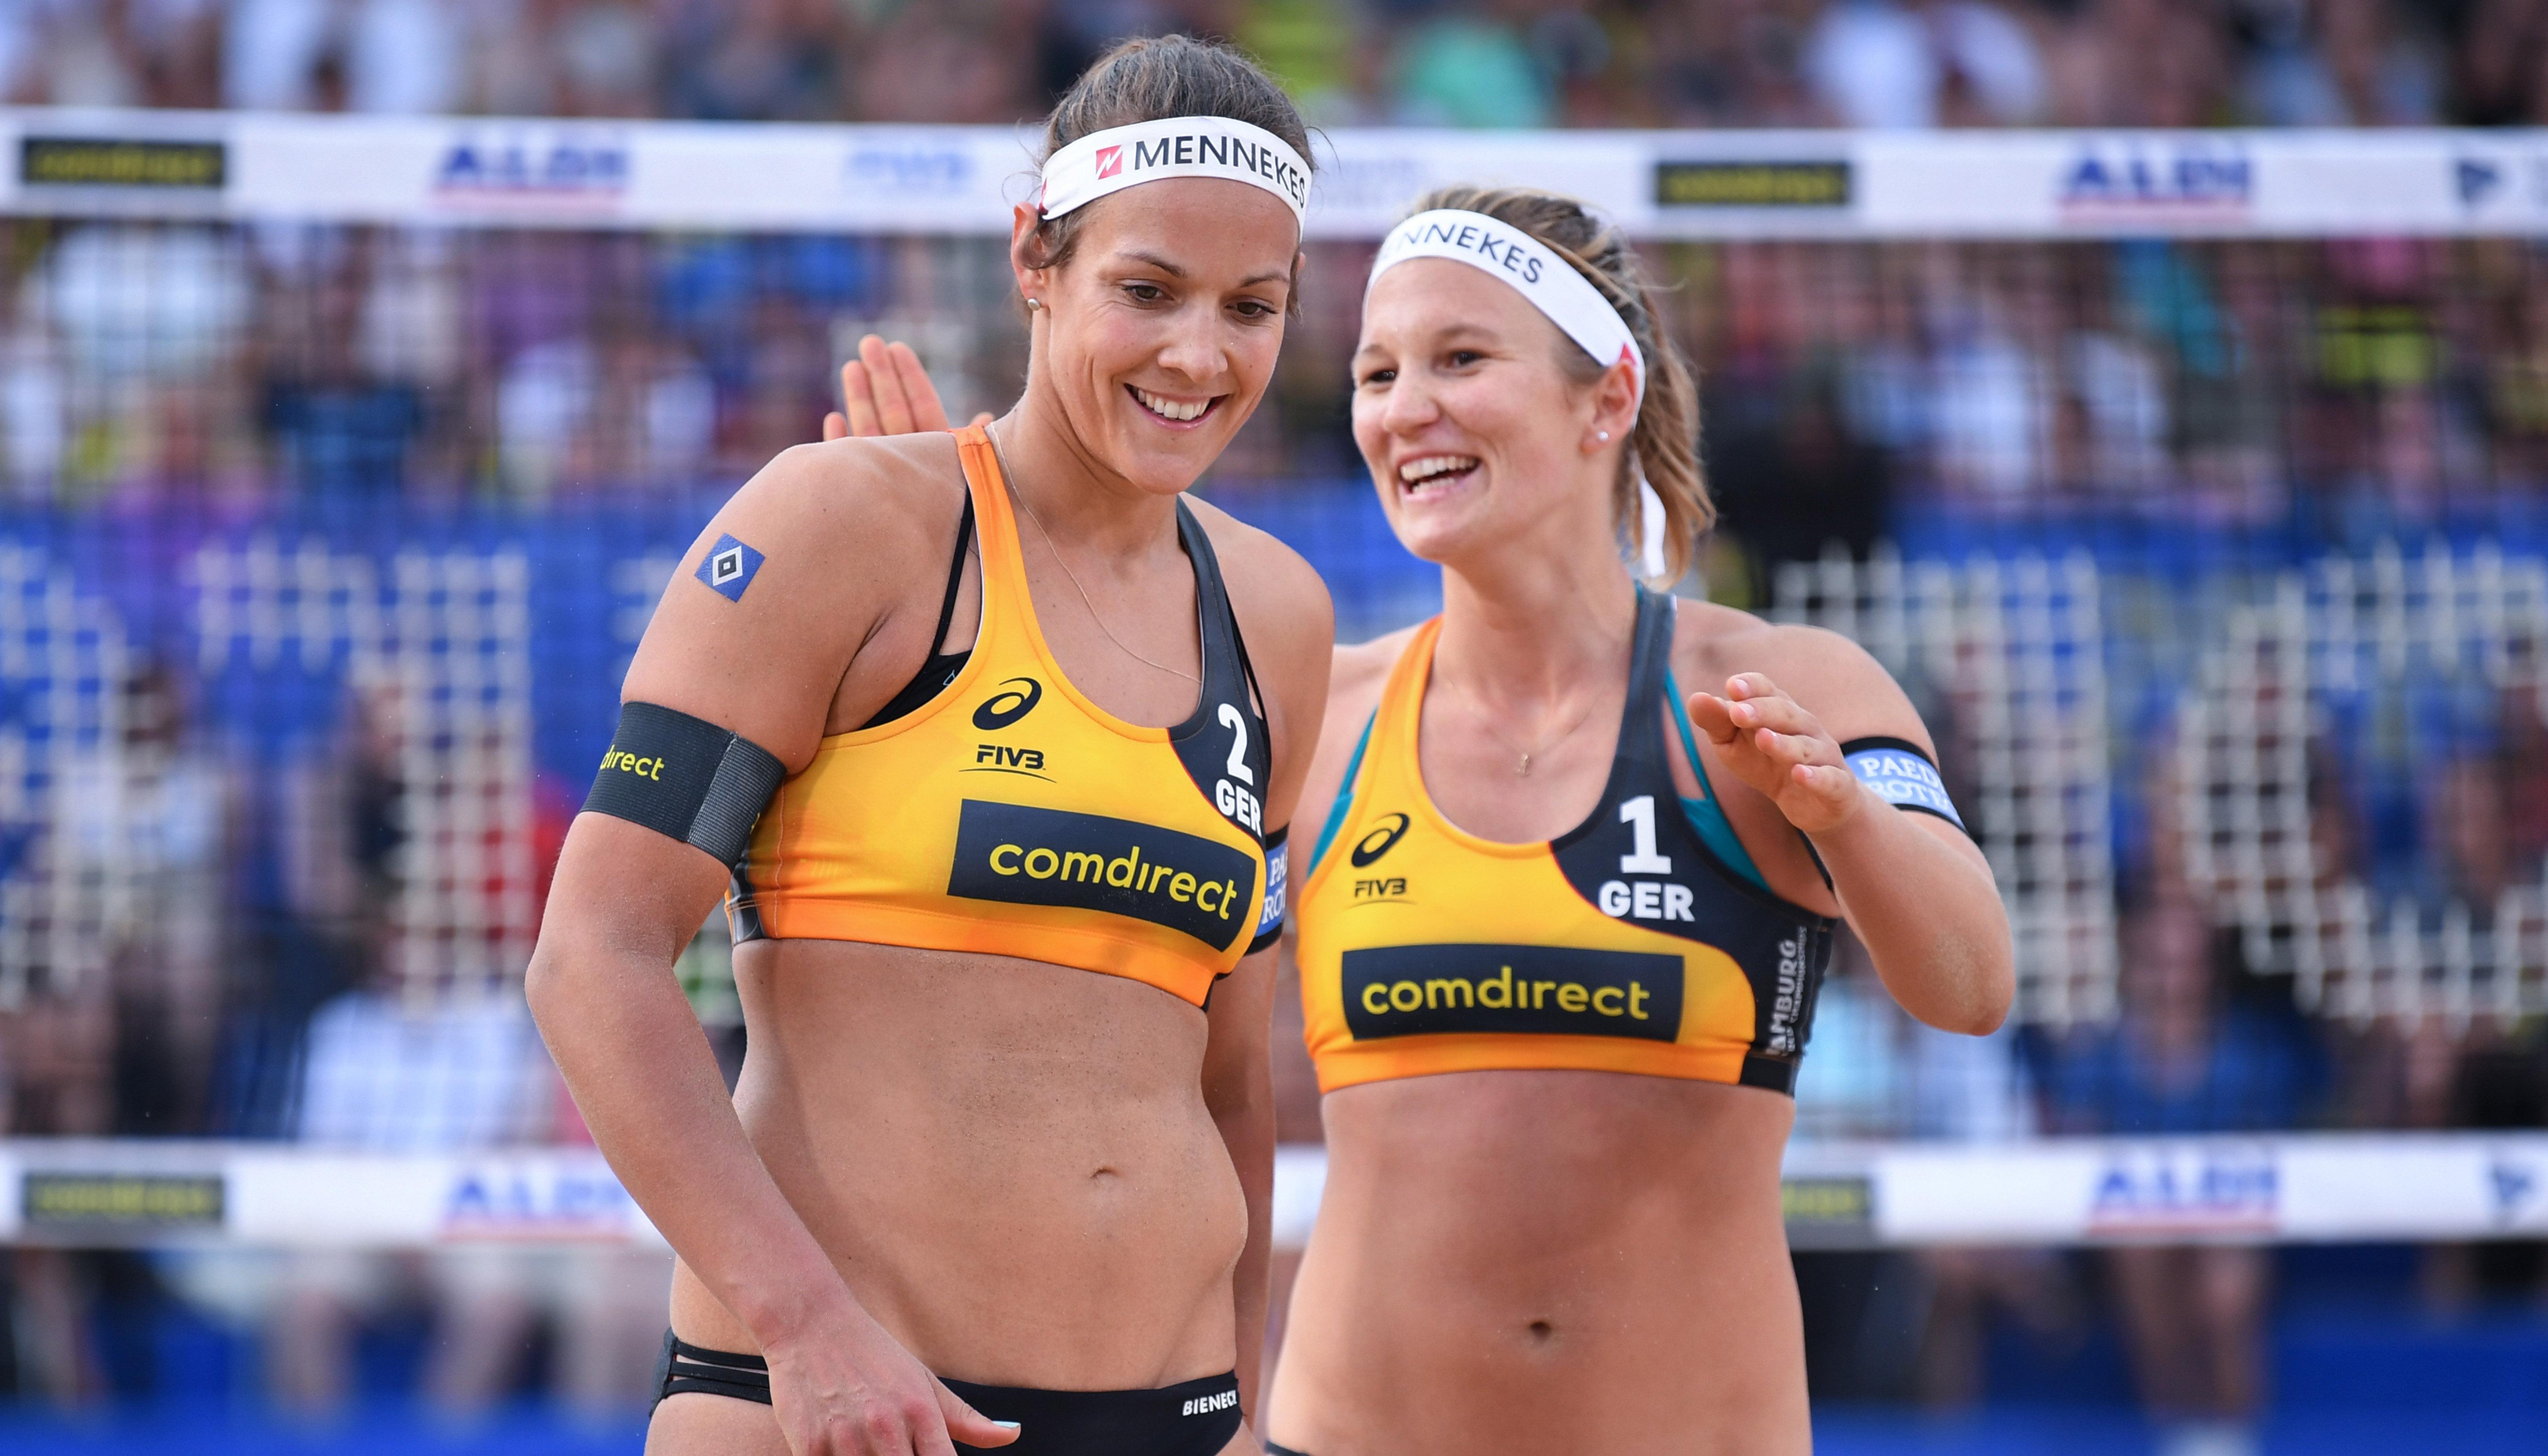 Beachvolleyball-WM: Medaillenchancen schwinden